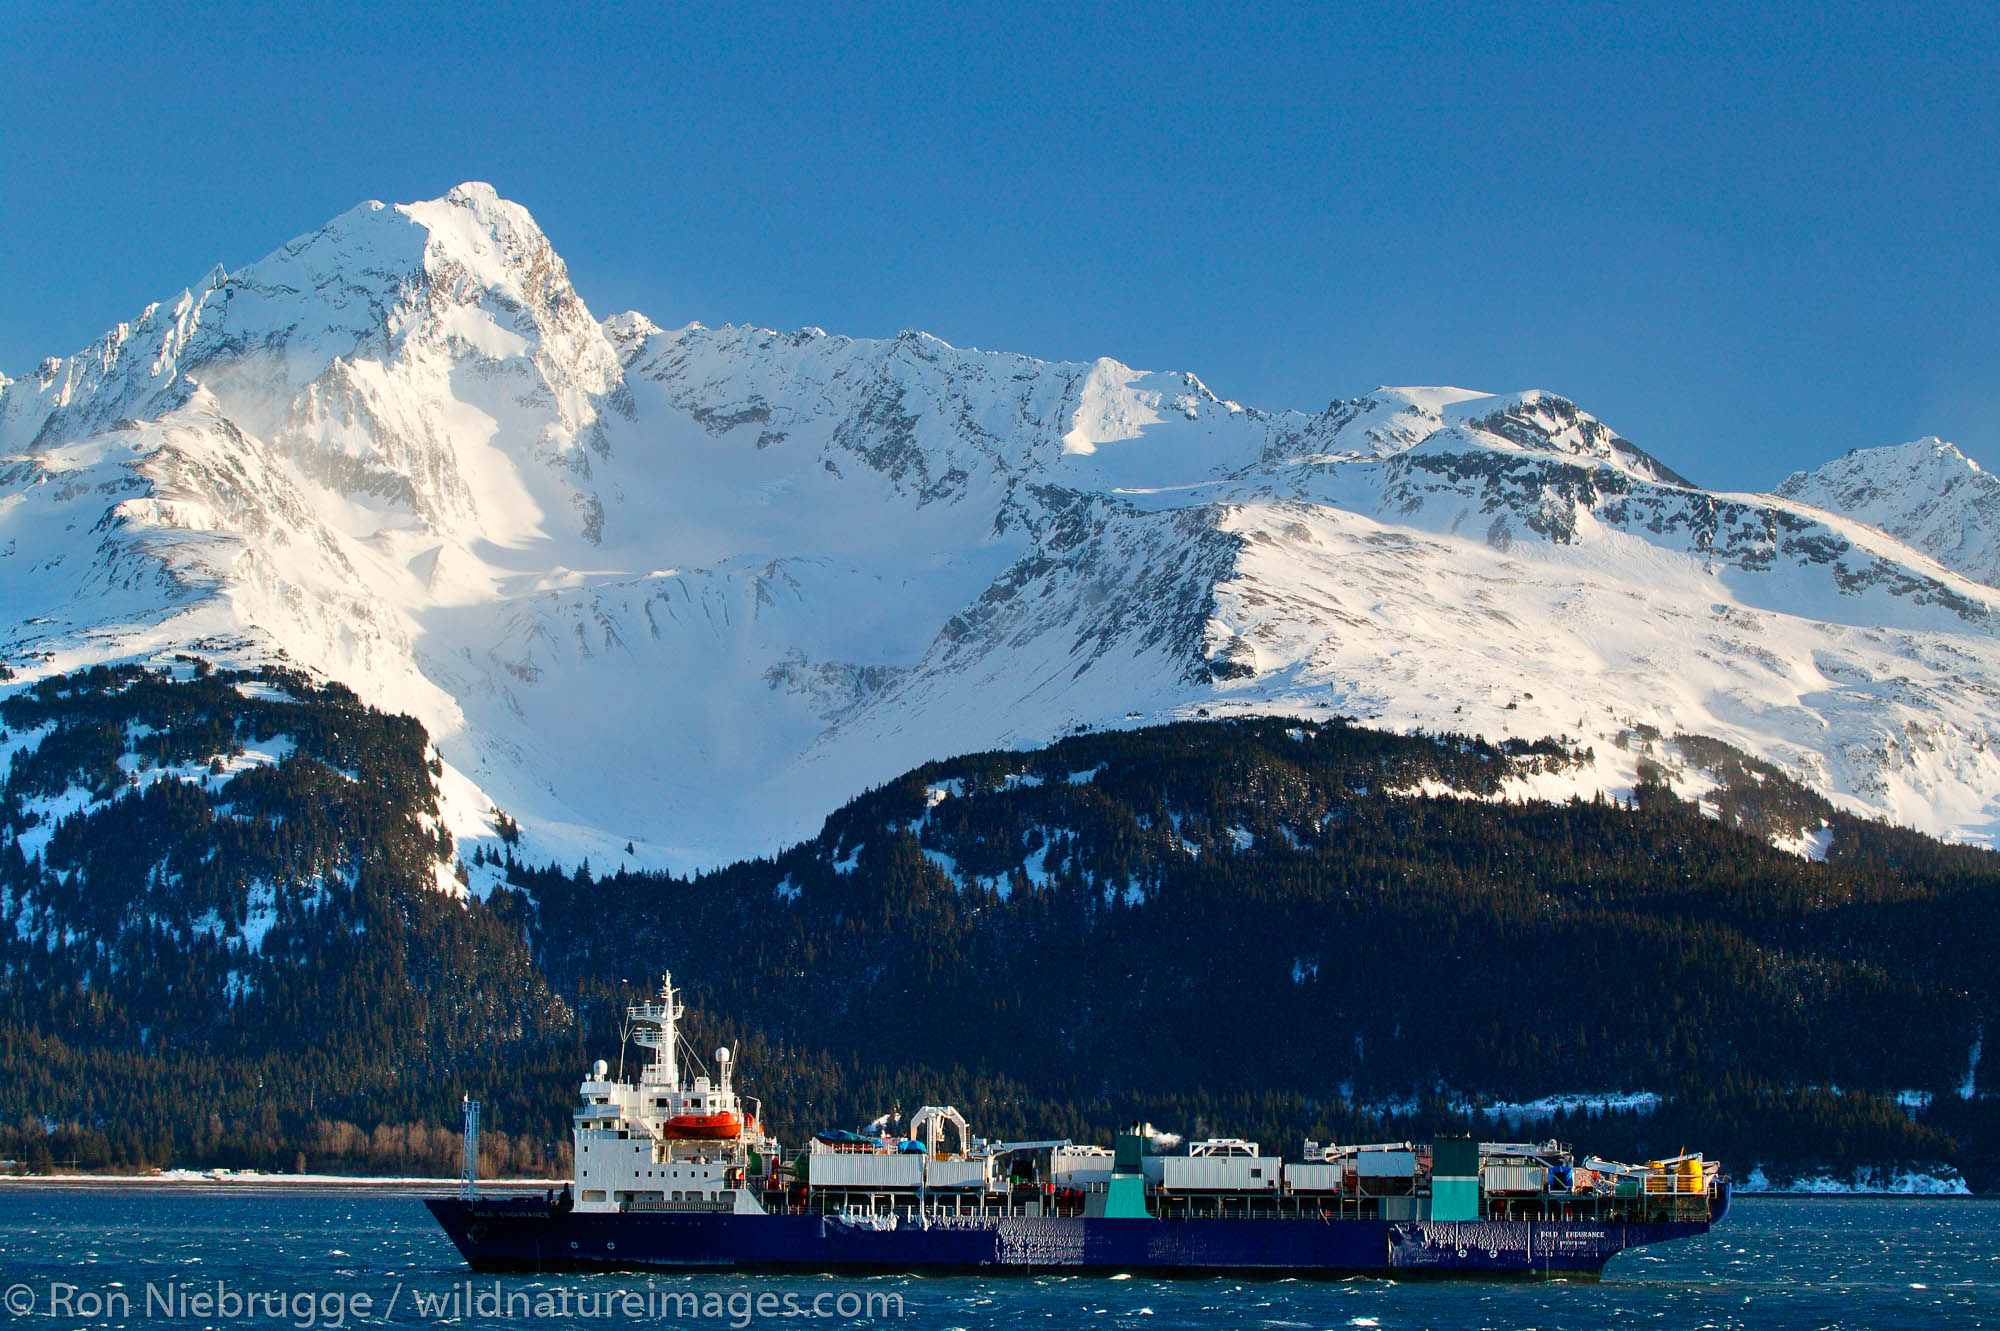 Fiber-optic cable laying ship the Bold Endurance, in Resurrection Bay, Seward, Alaska.